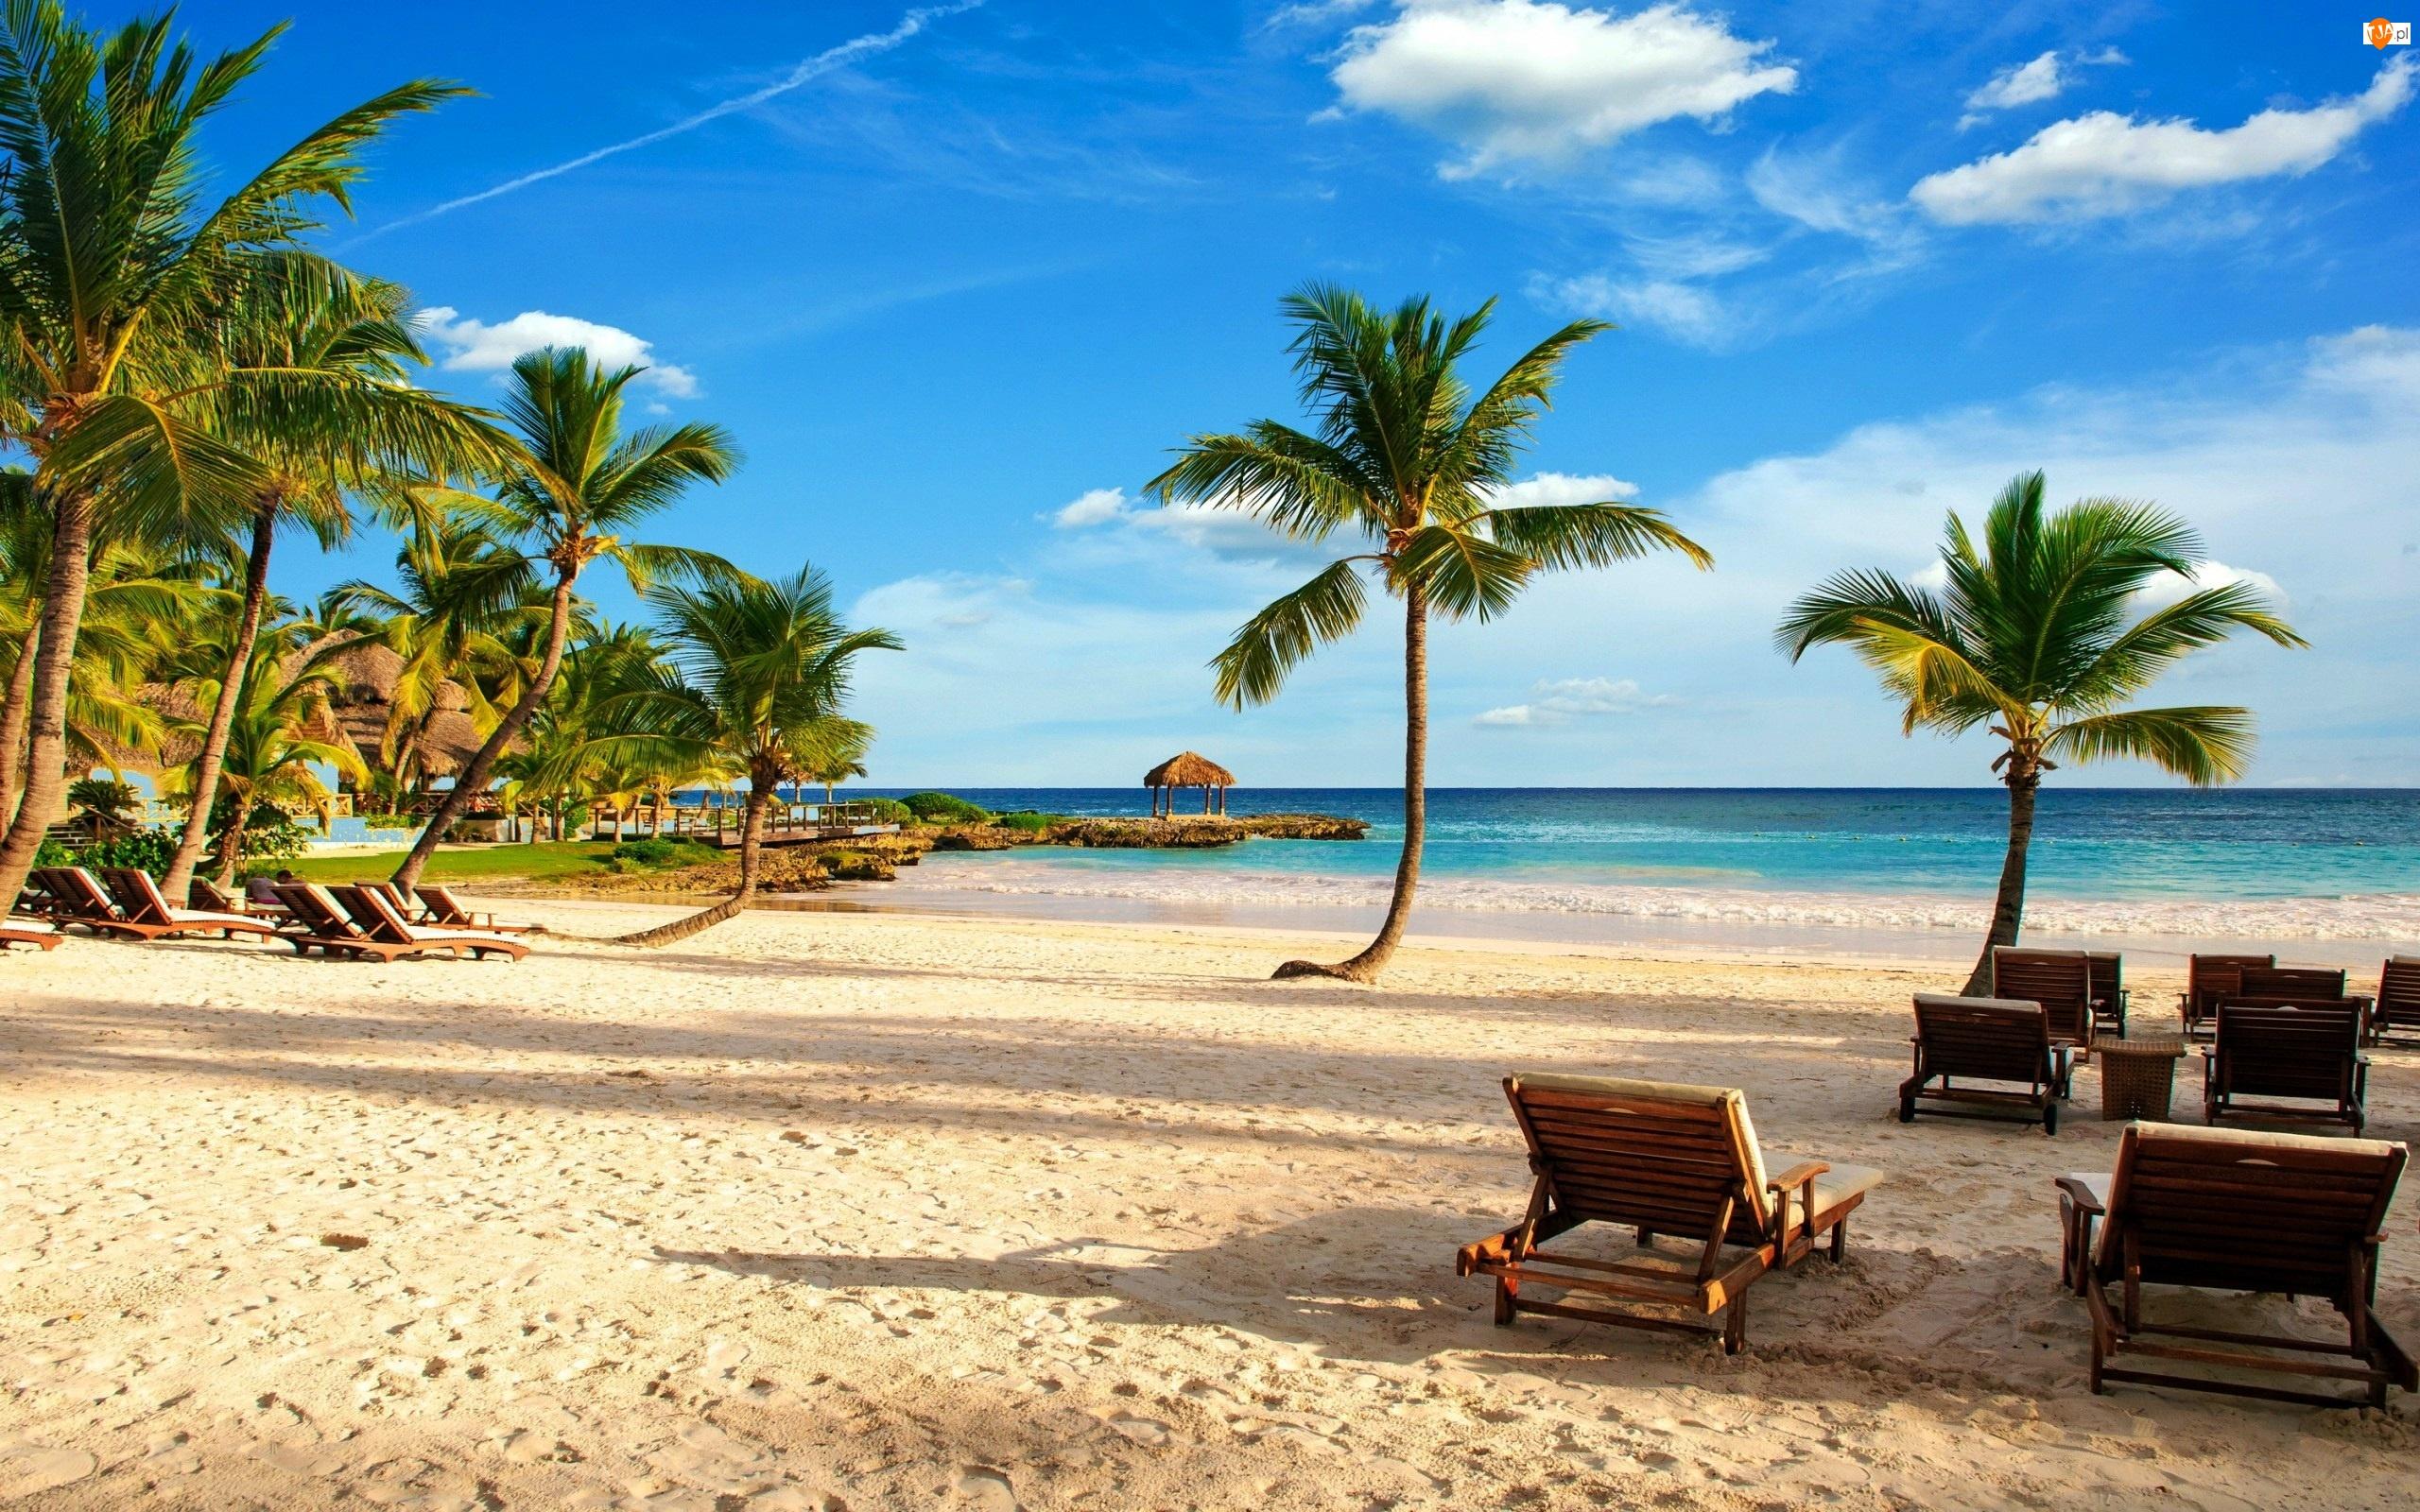 Wakacje, Ocean, Palma, Plaża, Leżaki